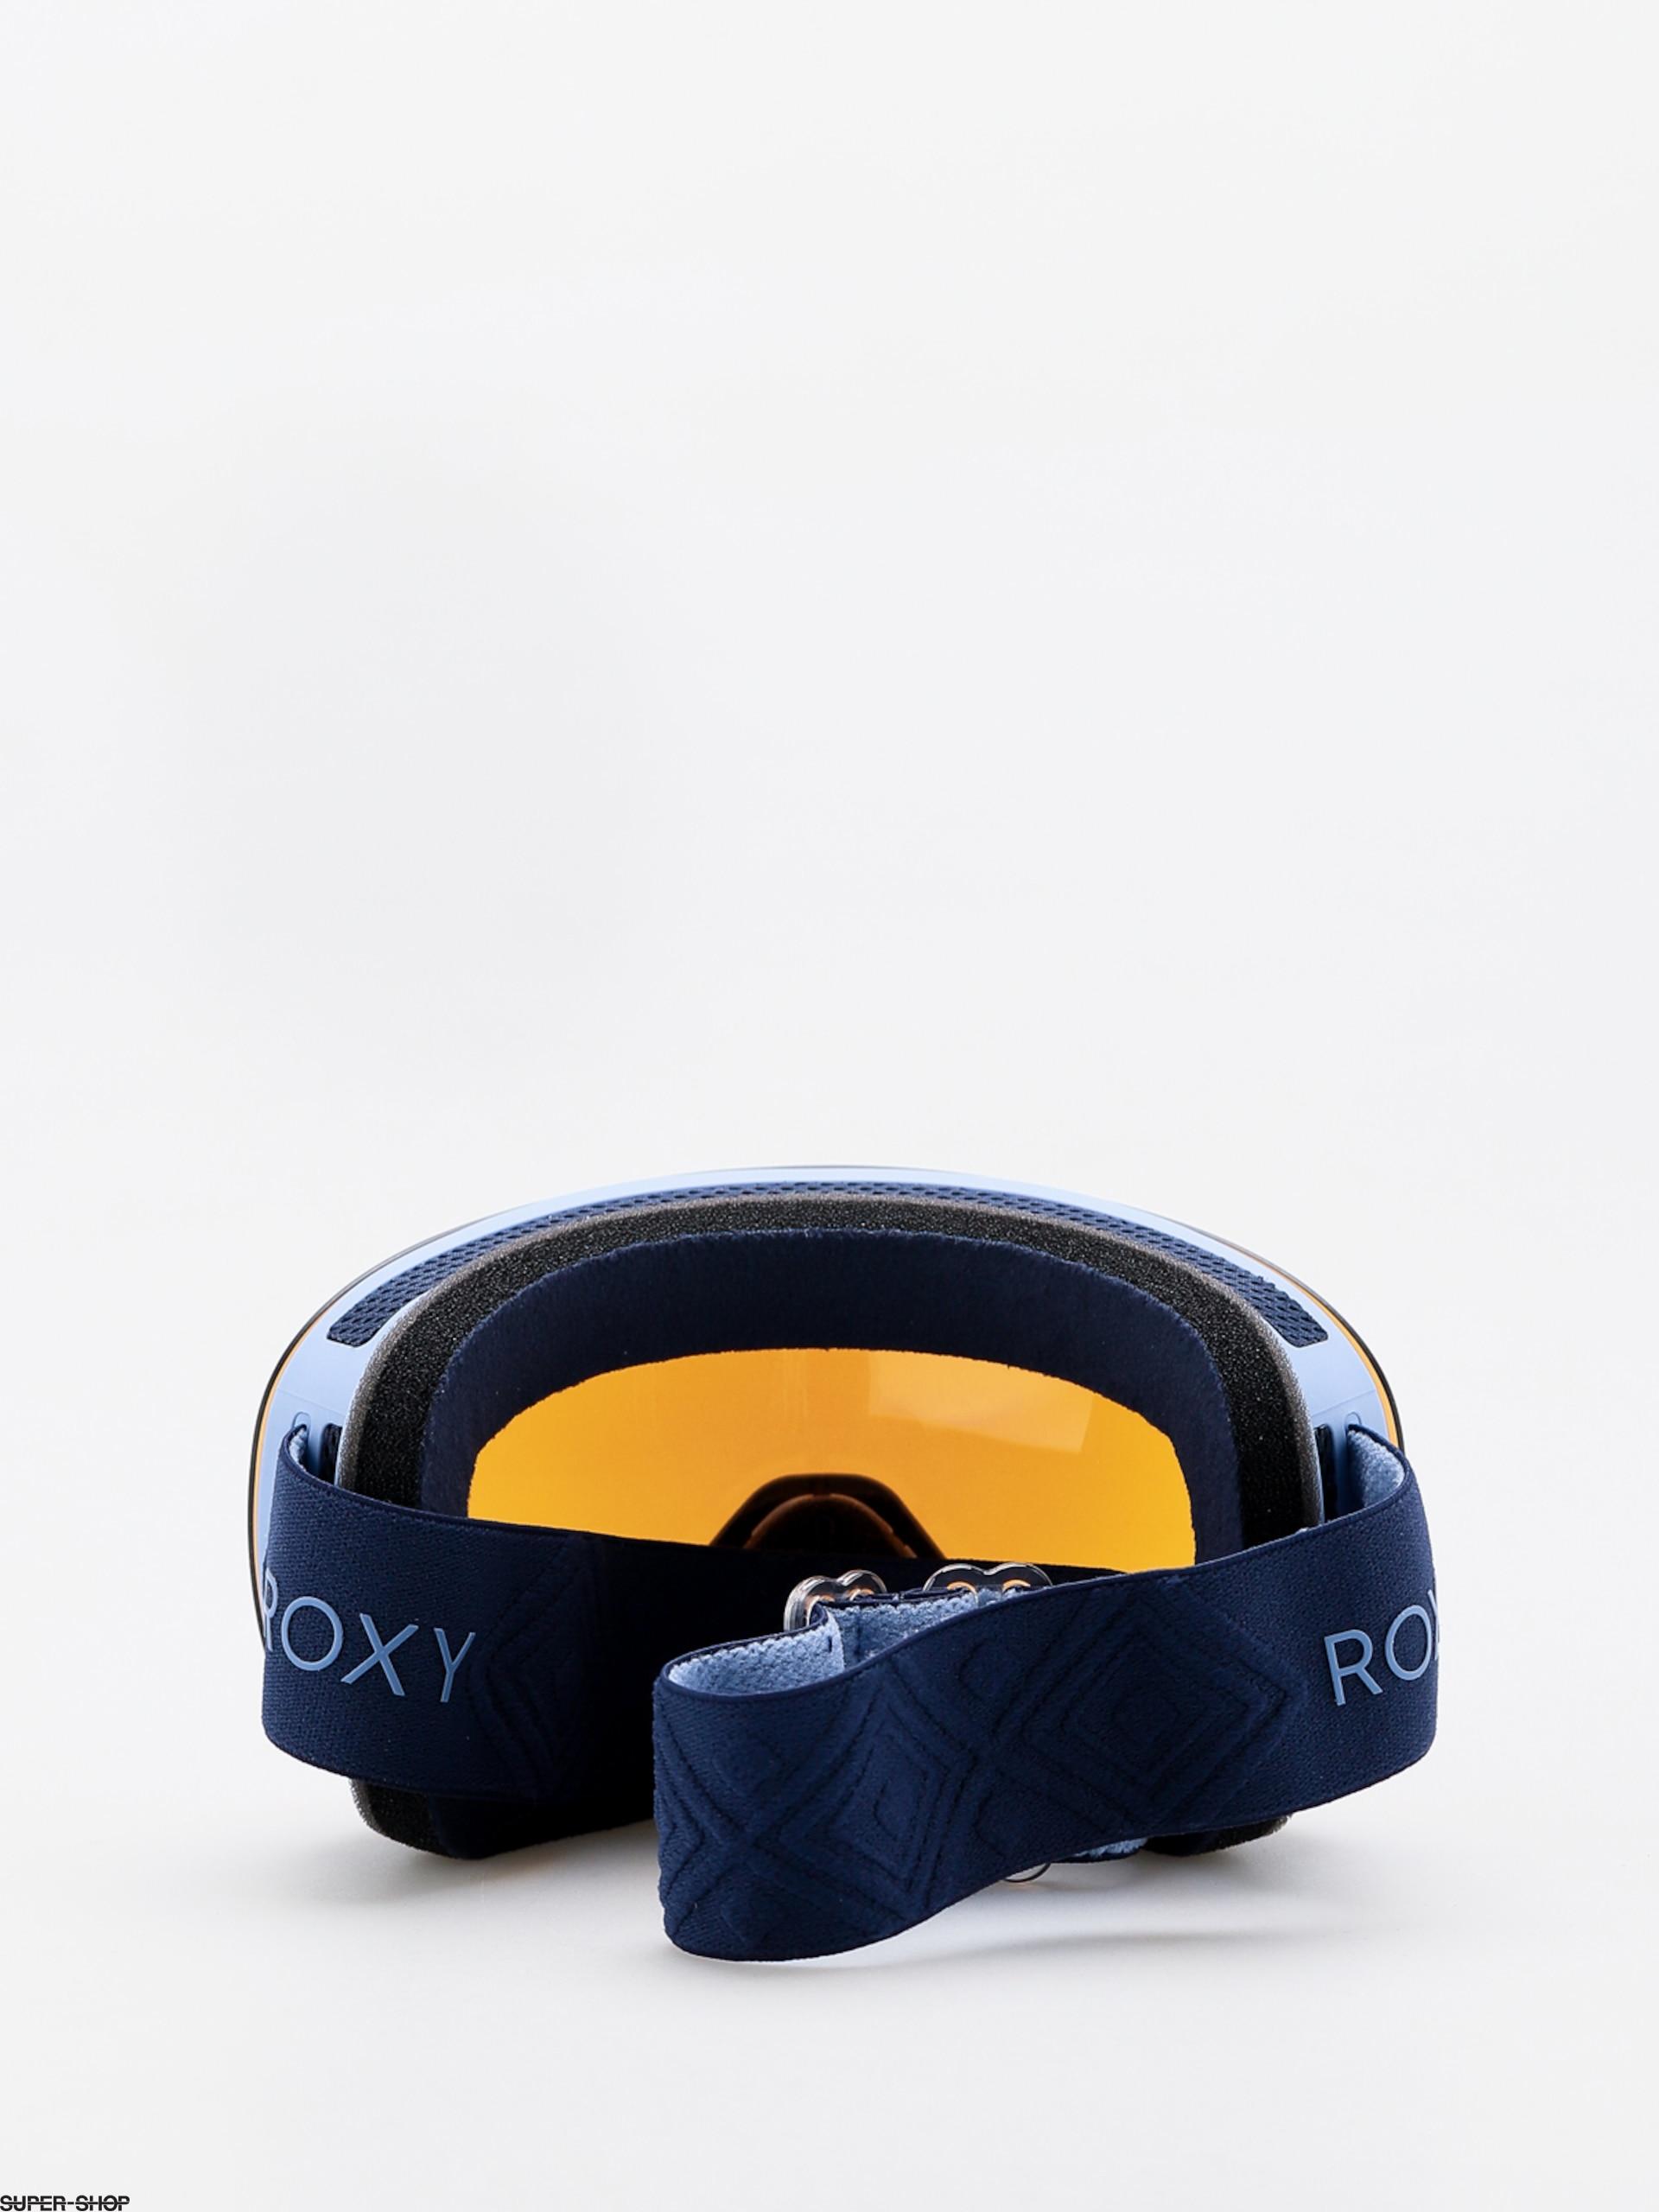 Roxy Popscreen Goggles Wmn